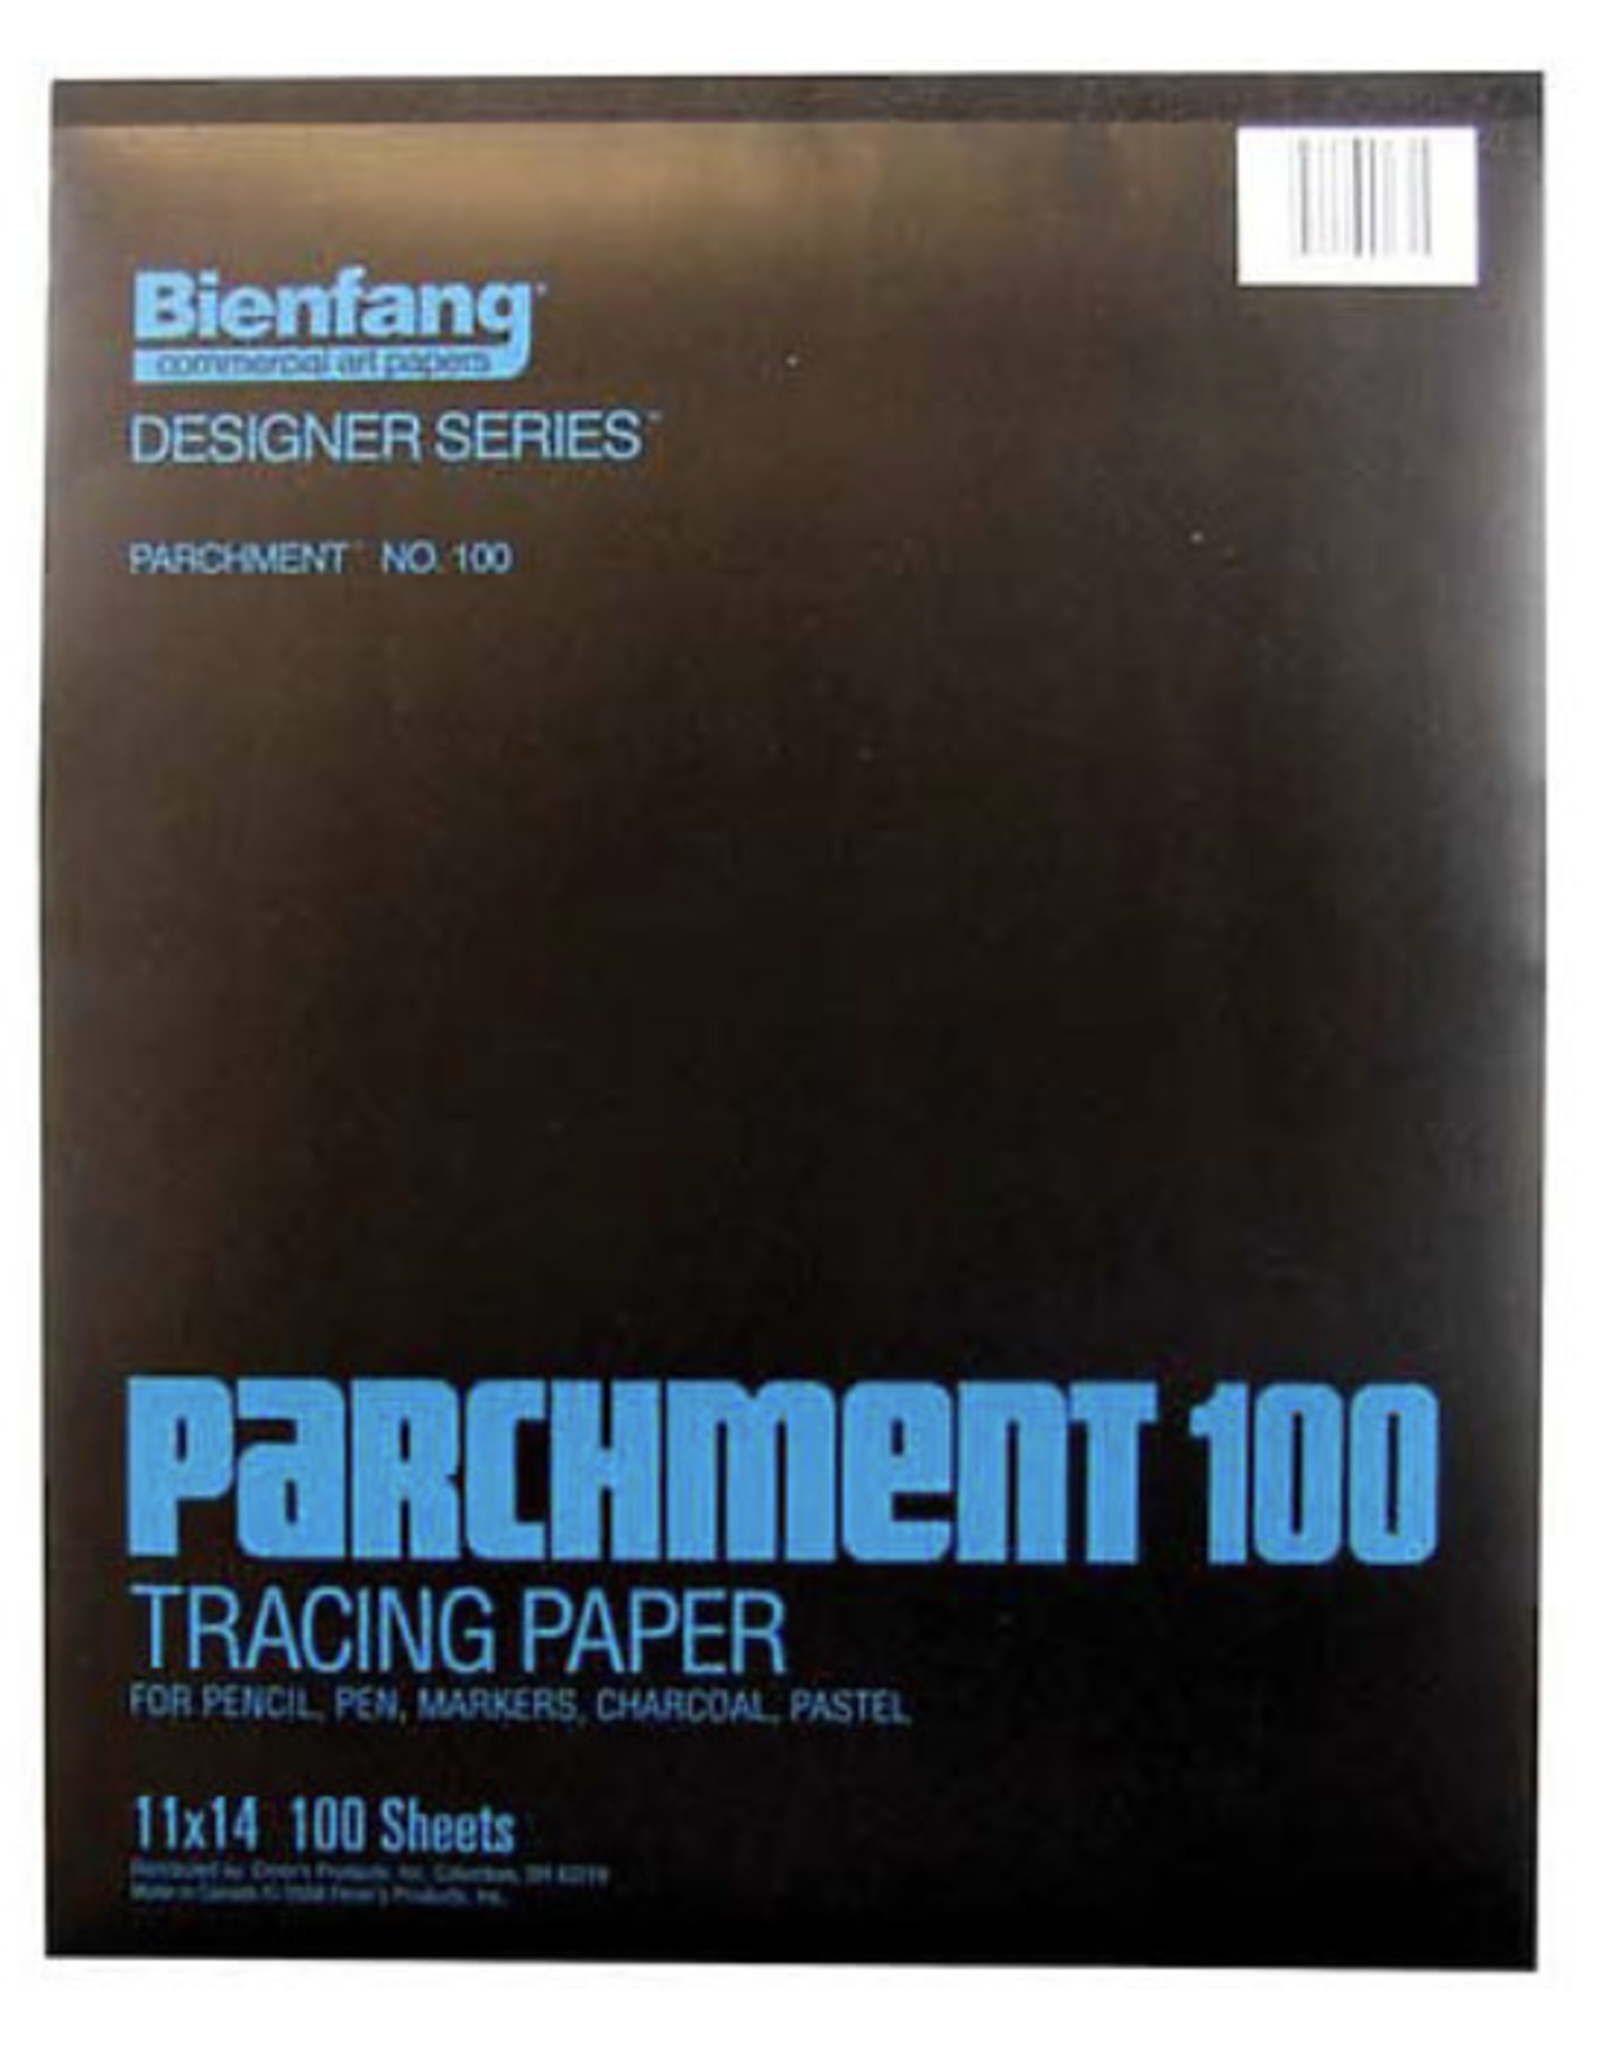 "Bienfang, Parchment 100 Tracing Paper, Pads 50 Sheets, 19"" x 24"""